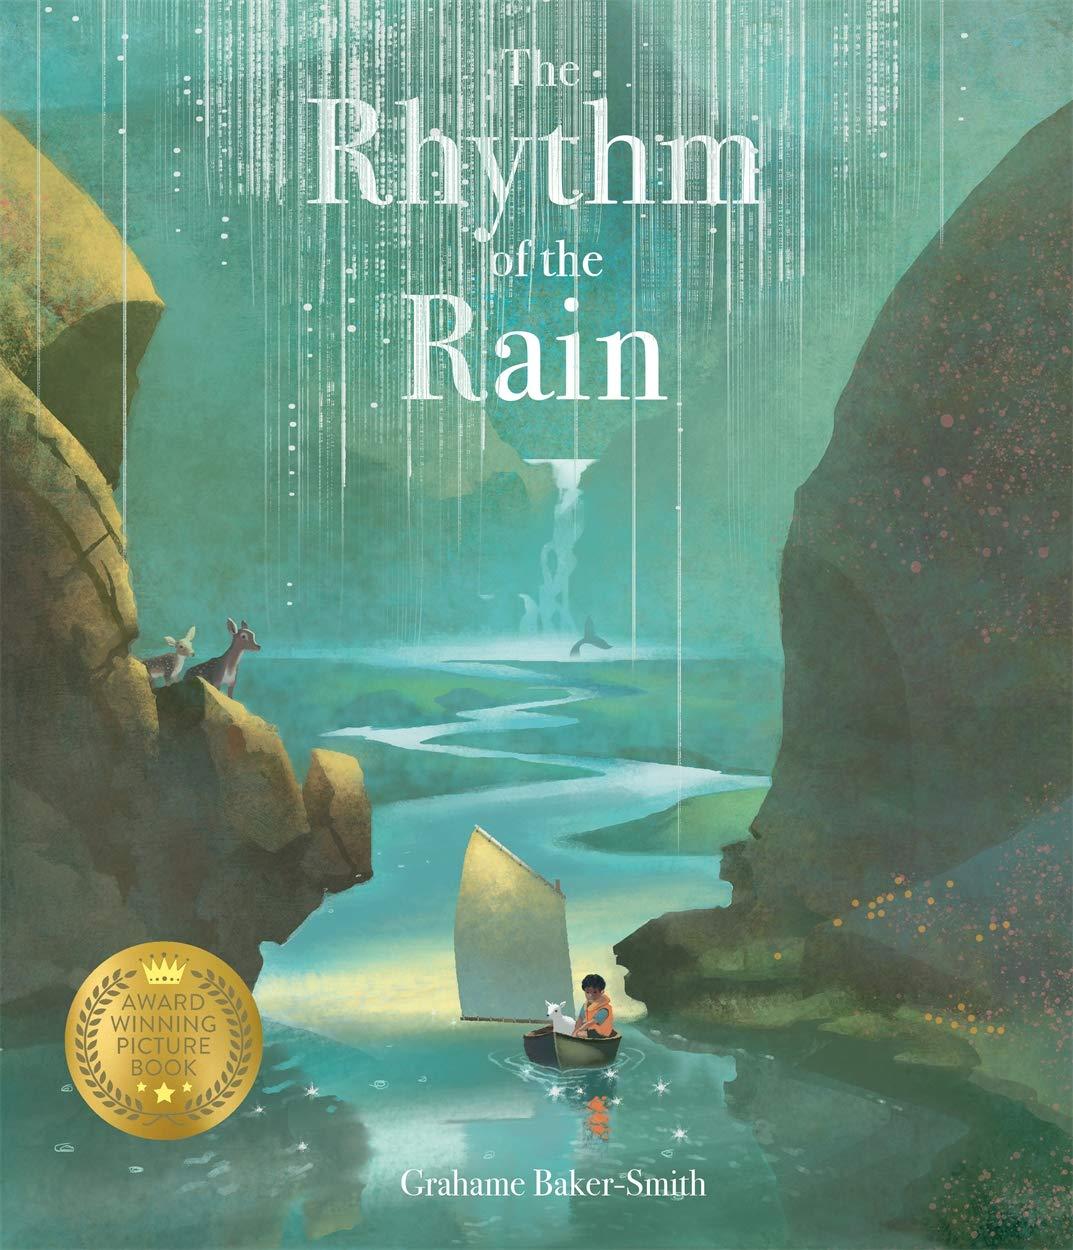 The Rhythm of the Rain: Amazon.co.uk: Baker-Smith, Grahame, Baker-Smith,  Grahame: 9781787410152: Books